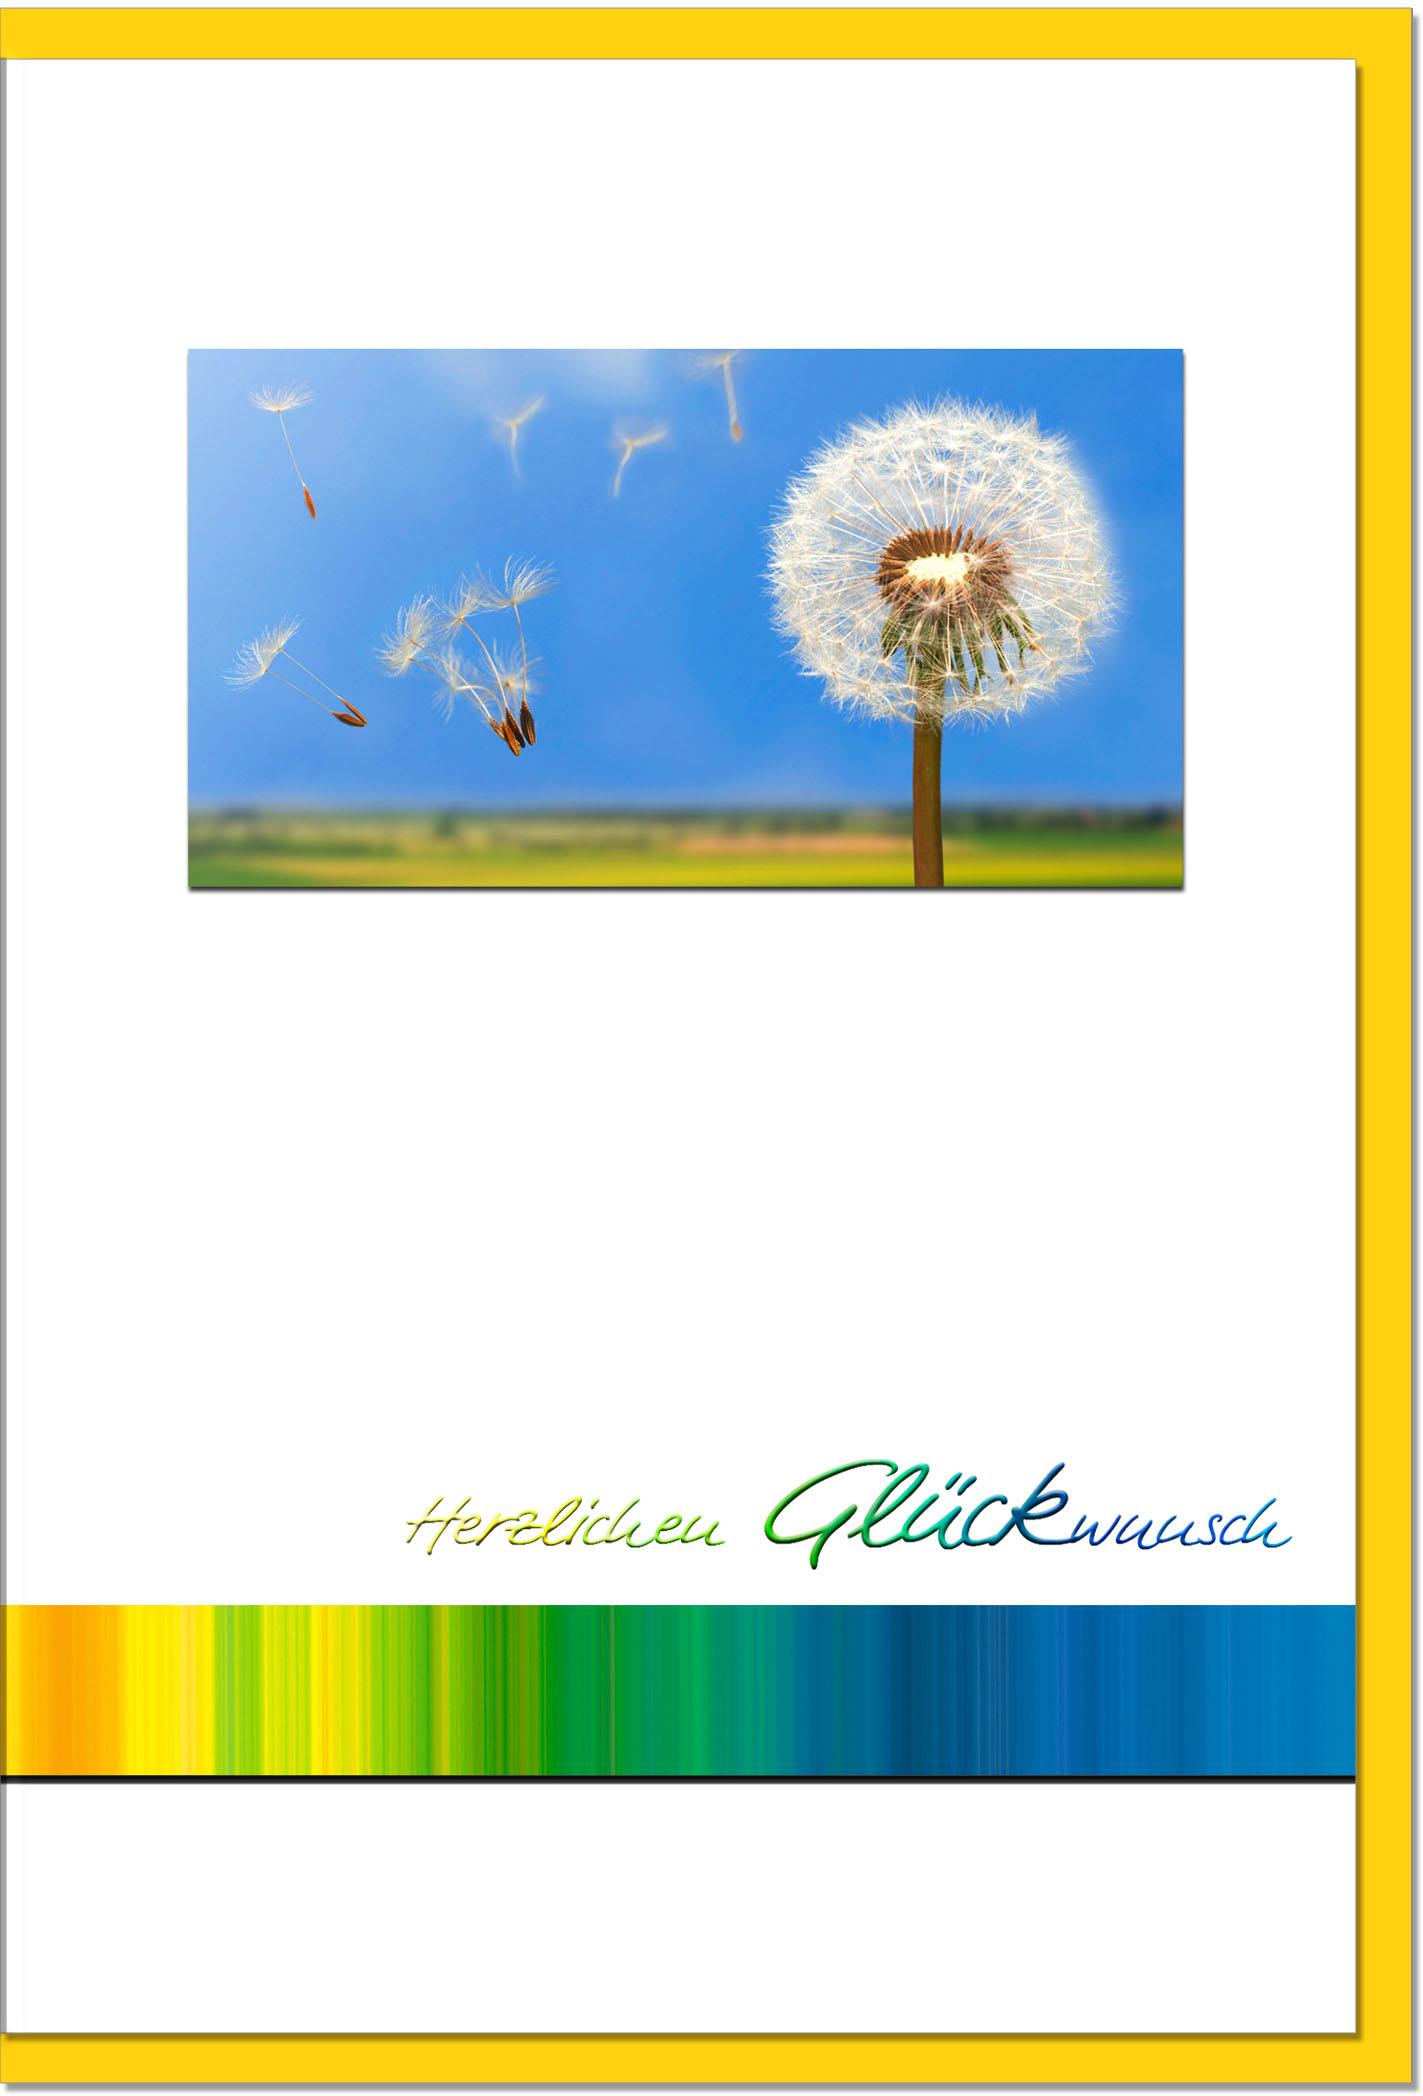 Glückwunschkarten / Grußkarten /Glückwunsch Pusteblume